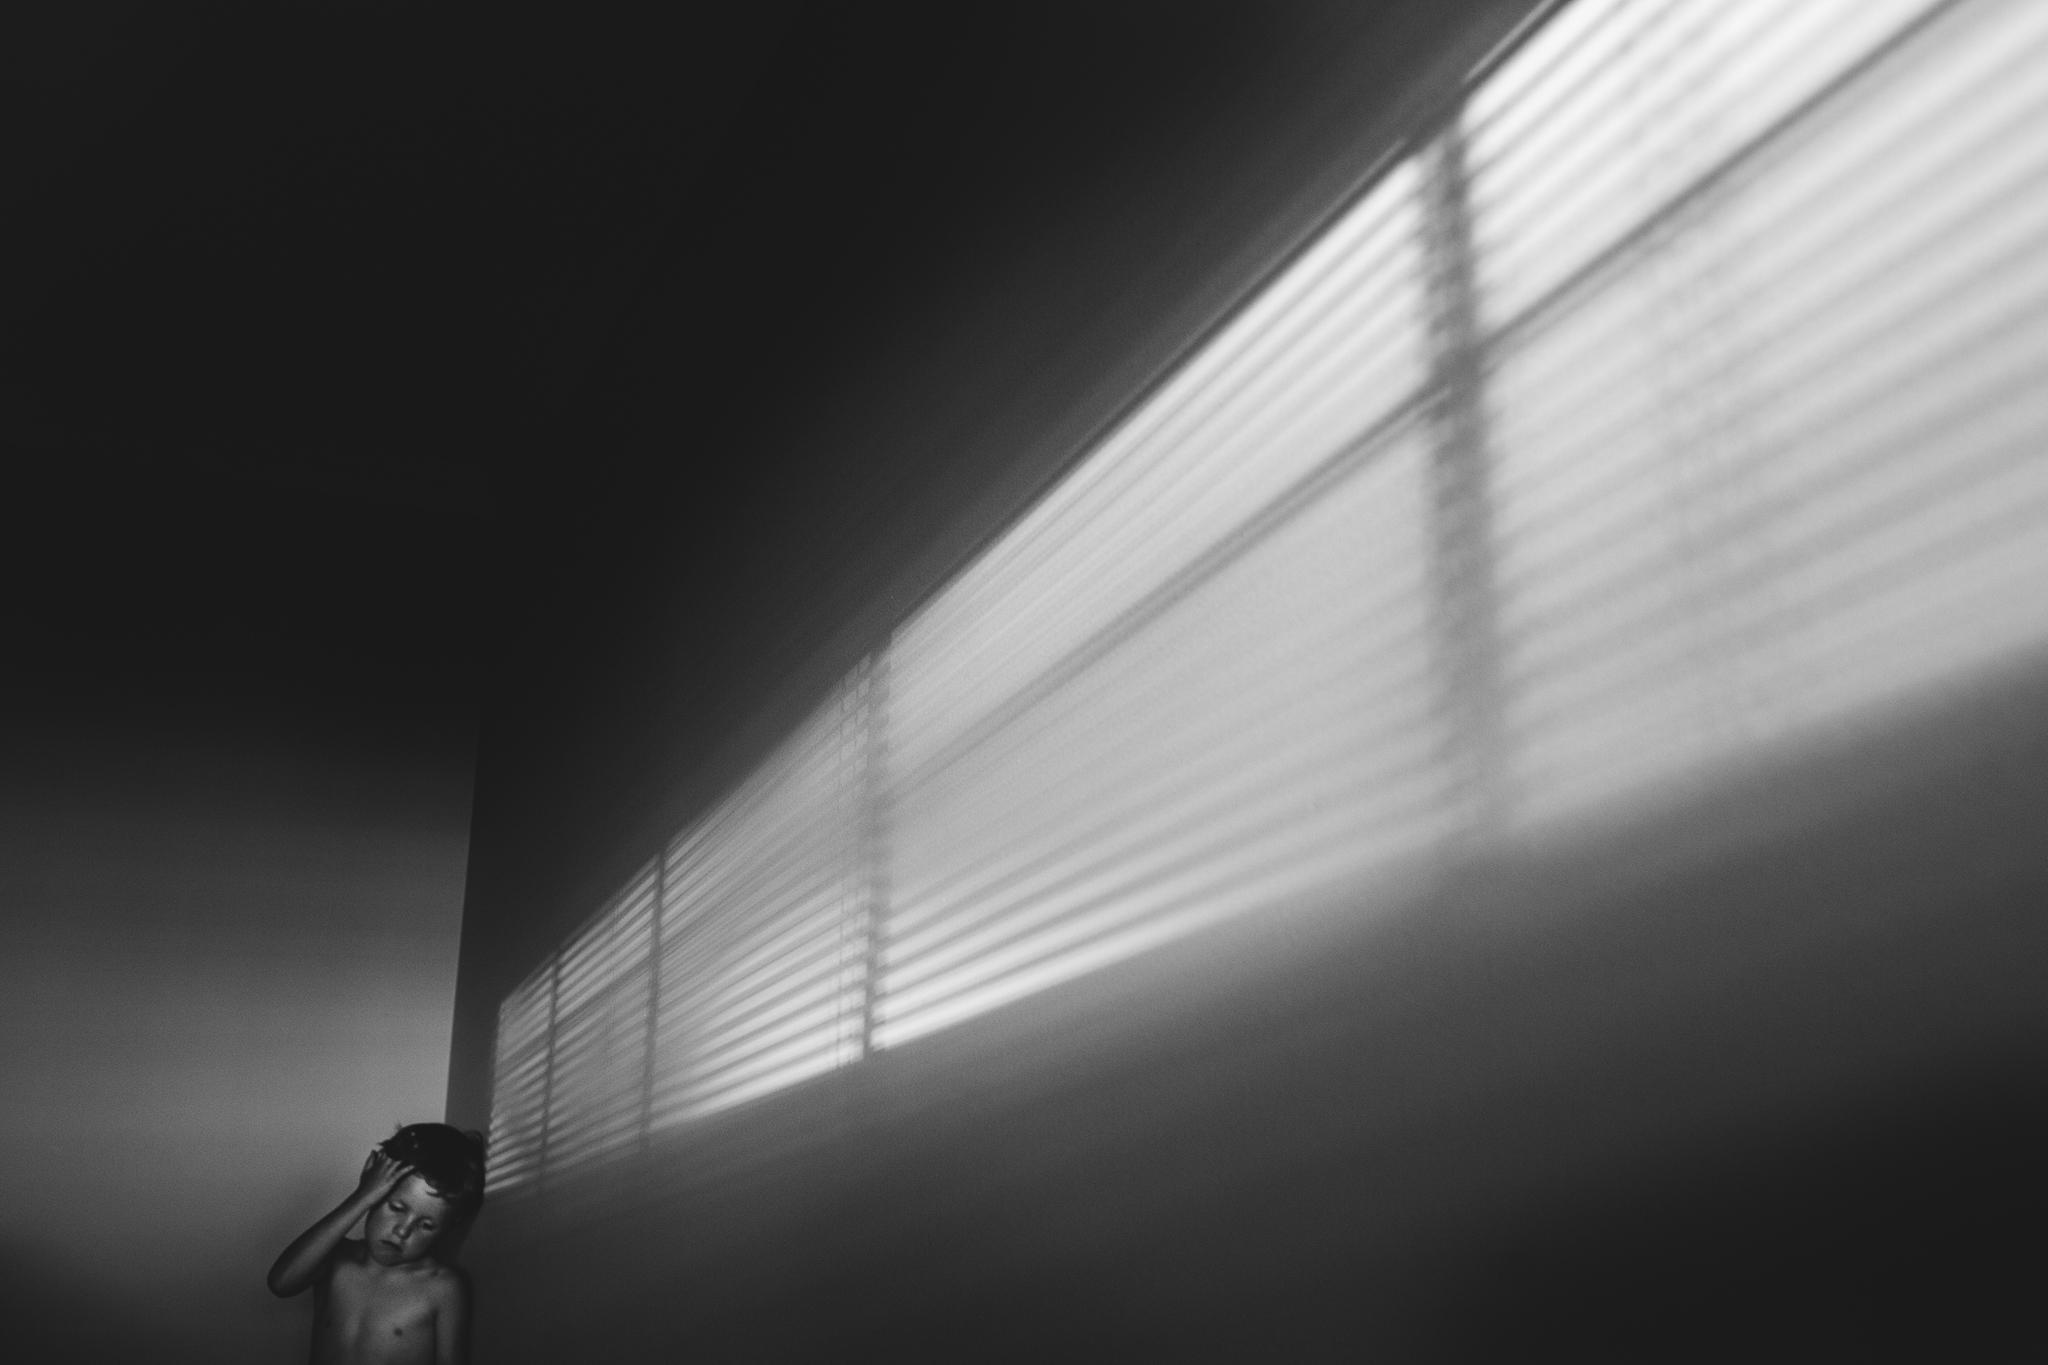 atticus stair light -1.jpg